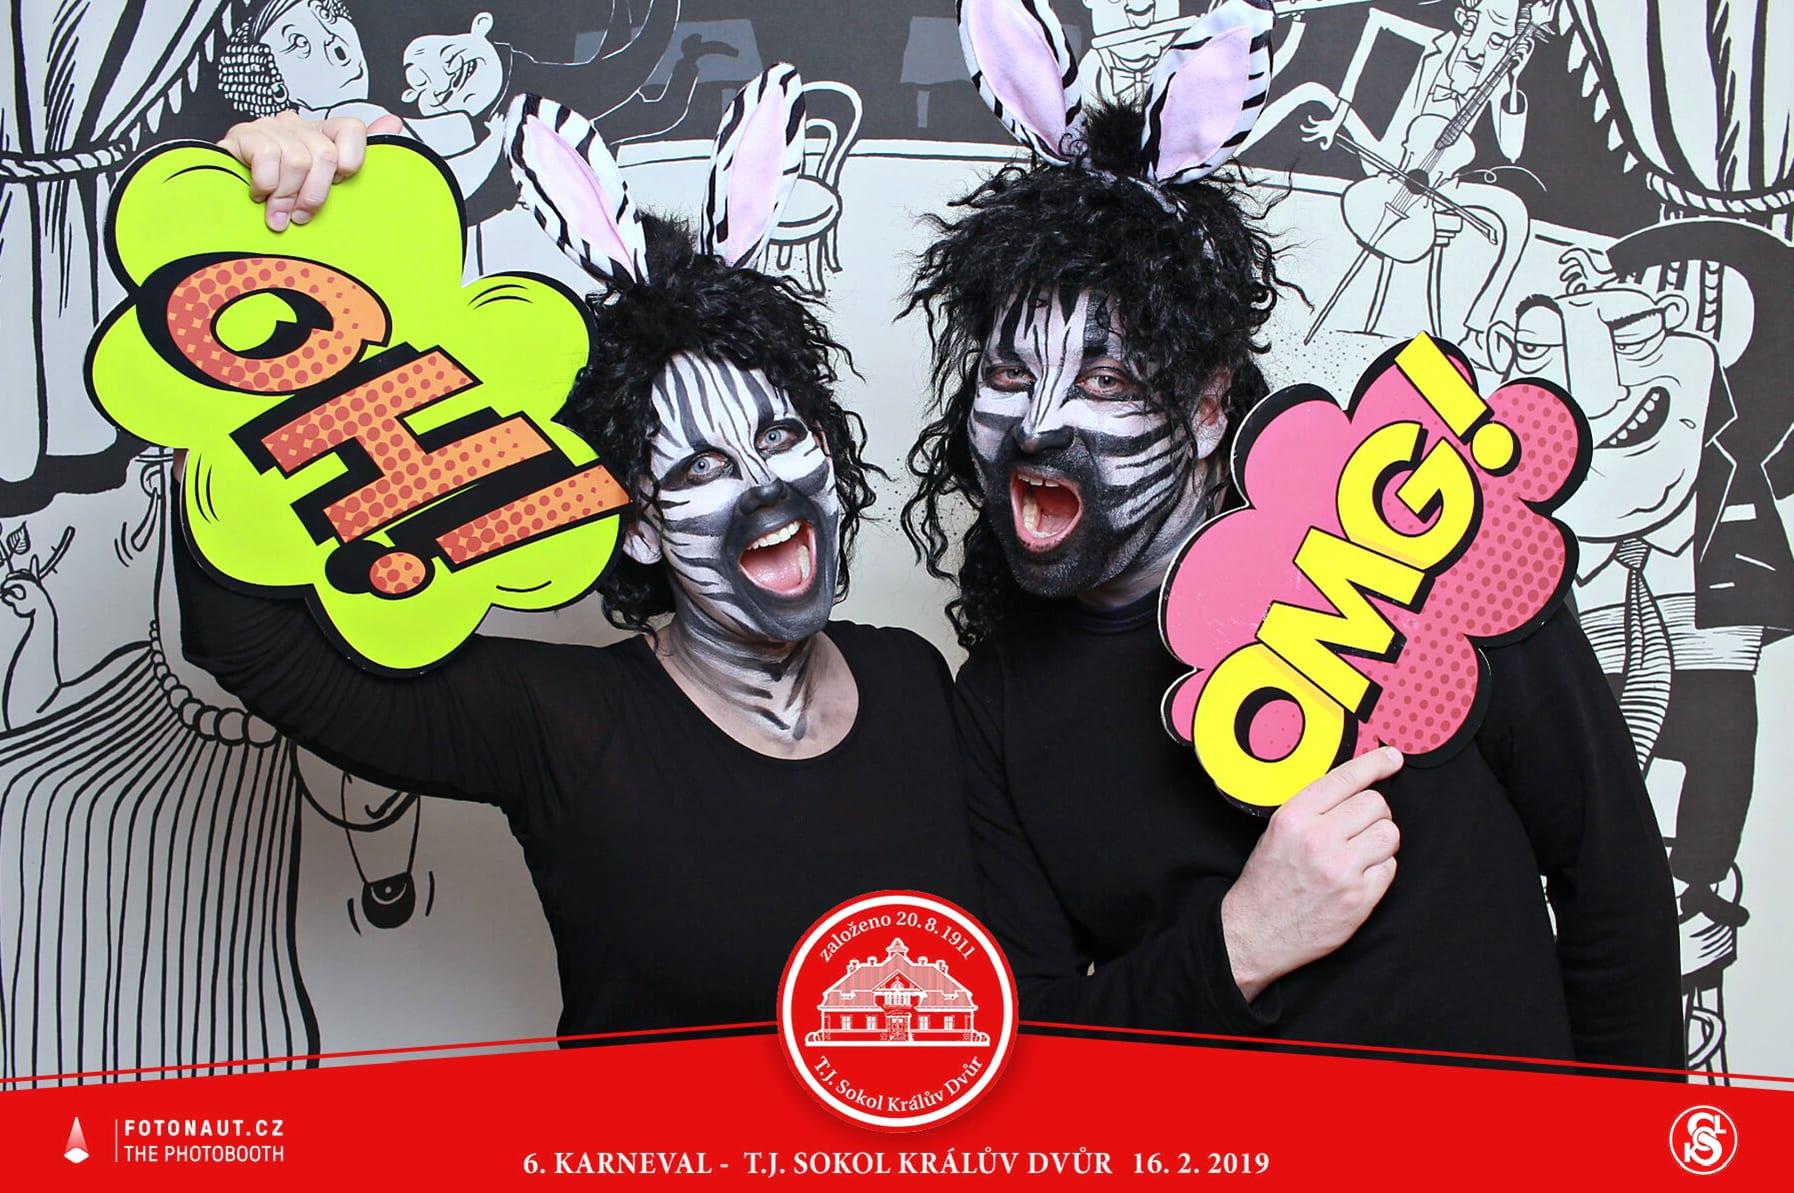 fotokoutek-6-karneval-t-j-sokol-kraluv-dvur-16-2-2019-580455